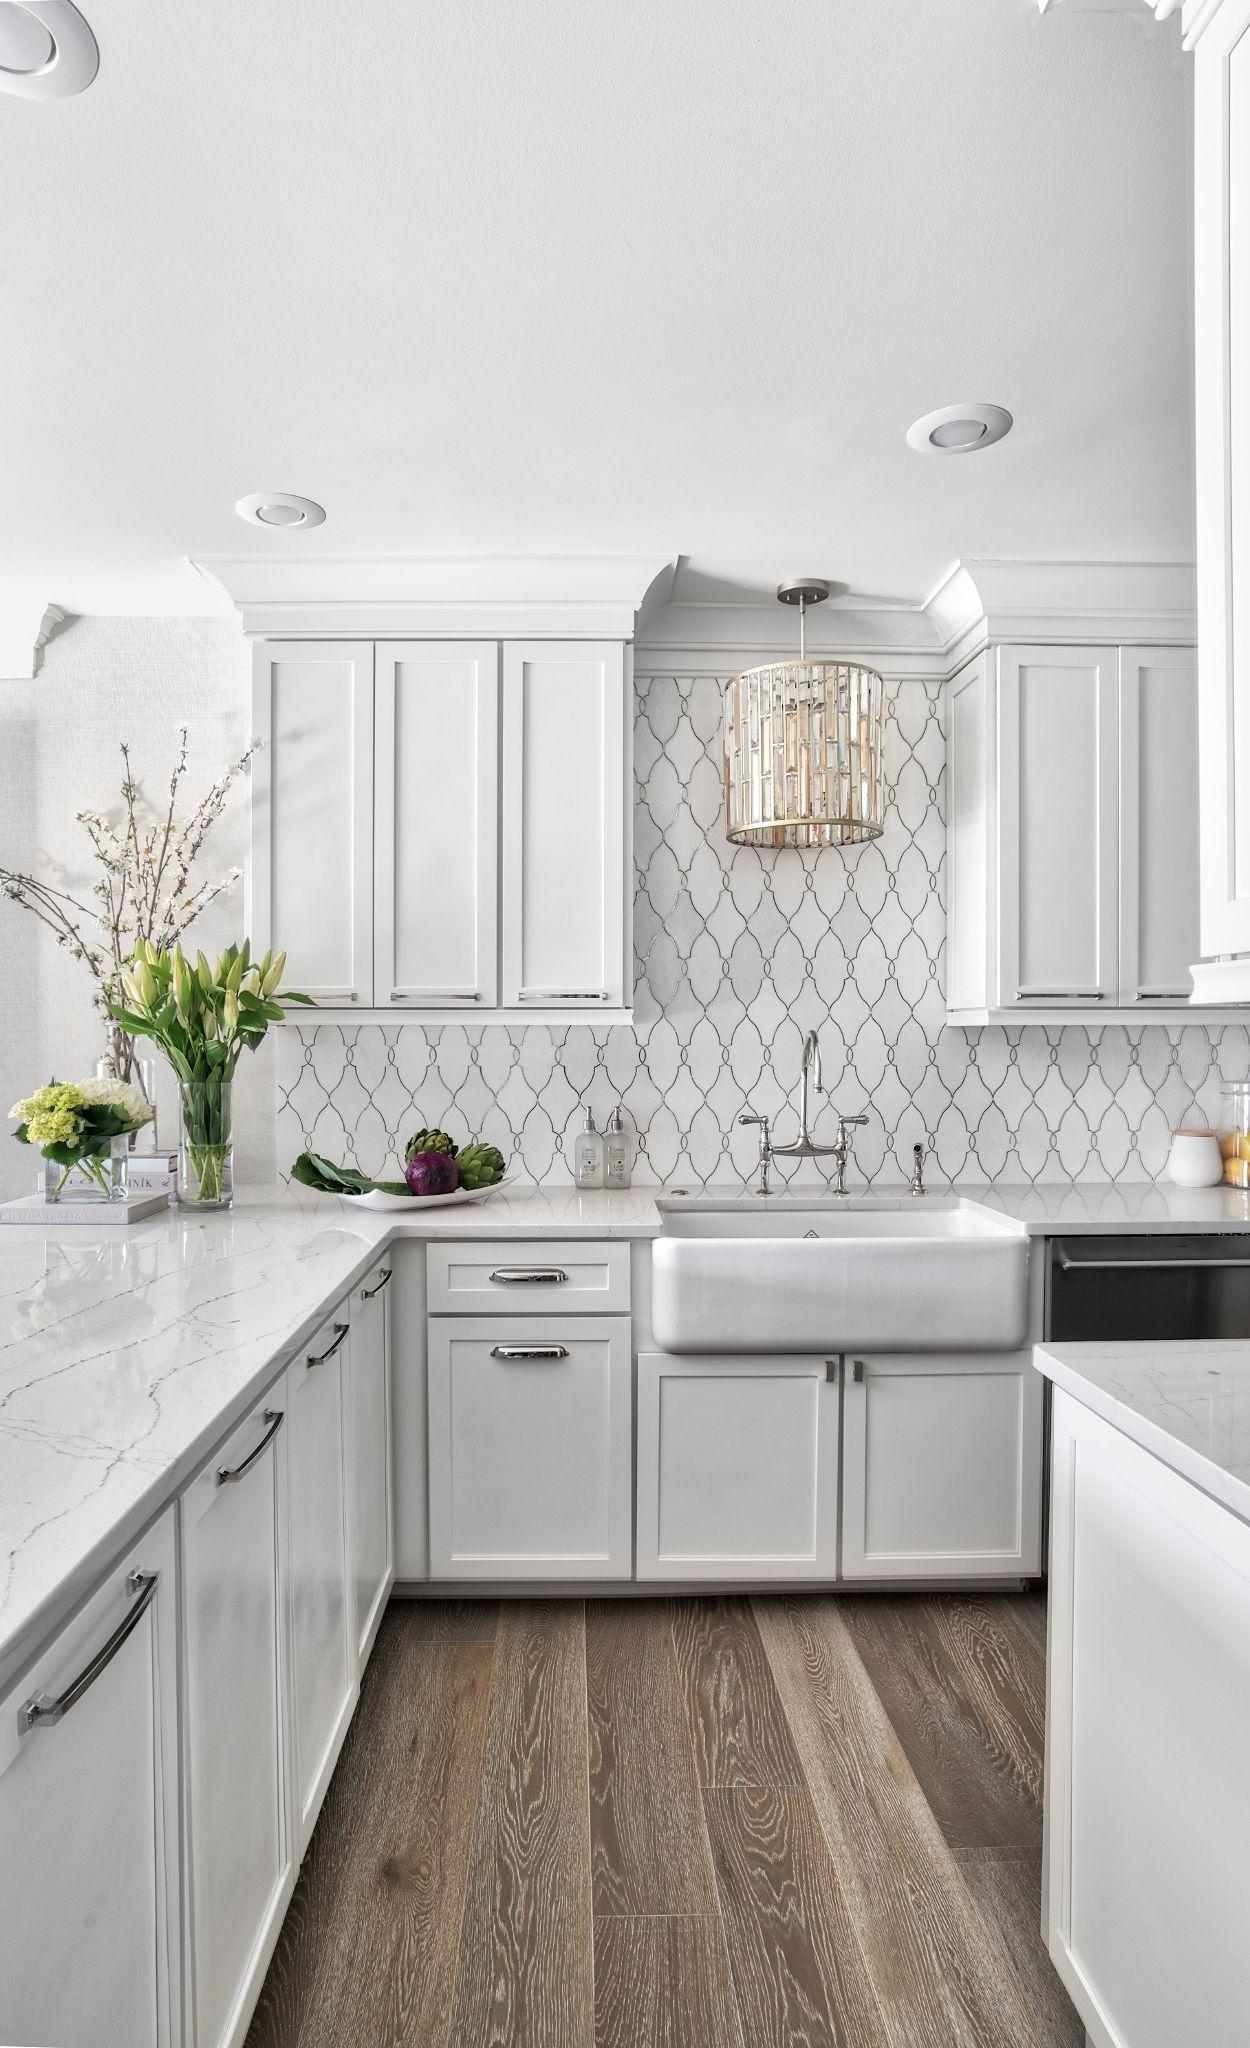 An elegant pairing of Ella™ countertops and tile backsplash.